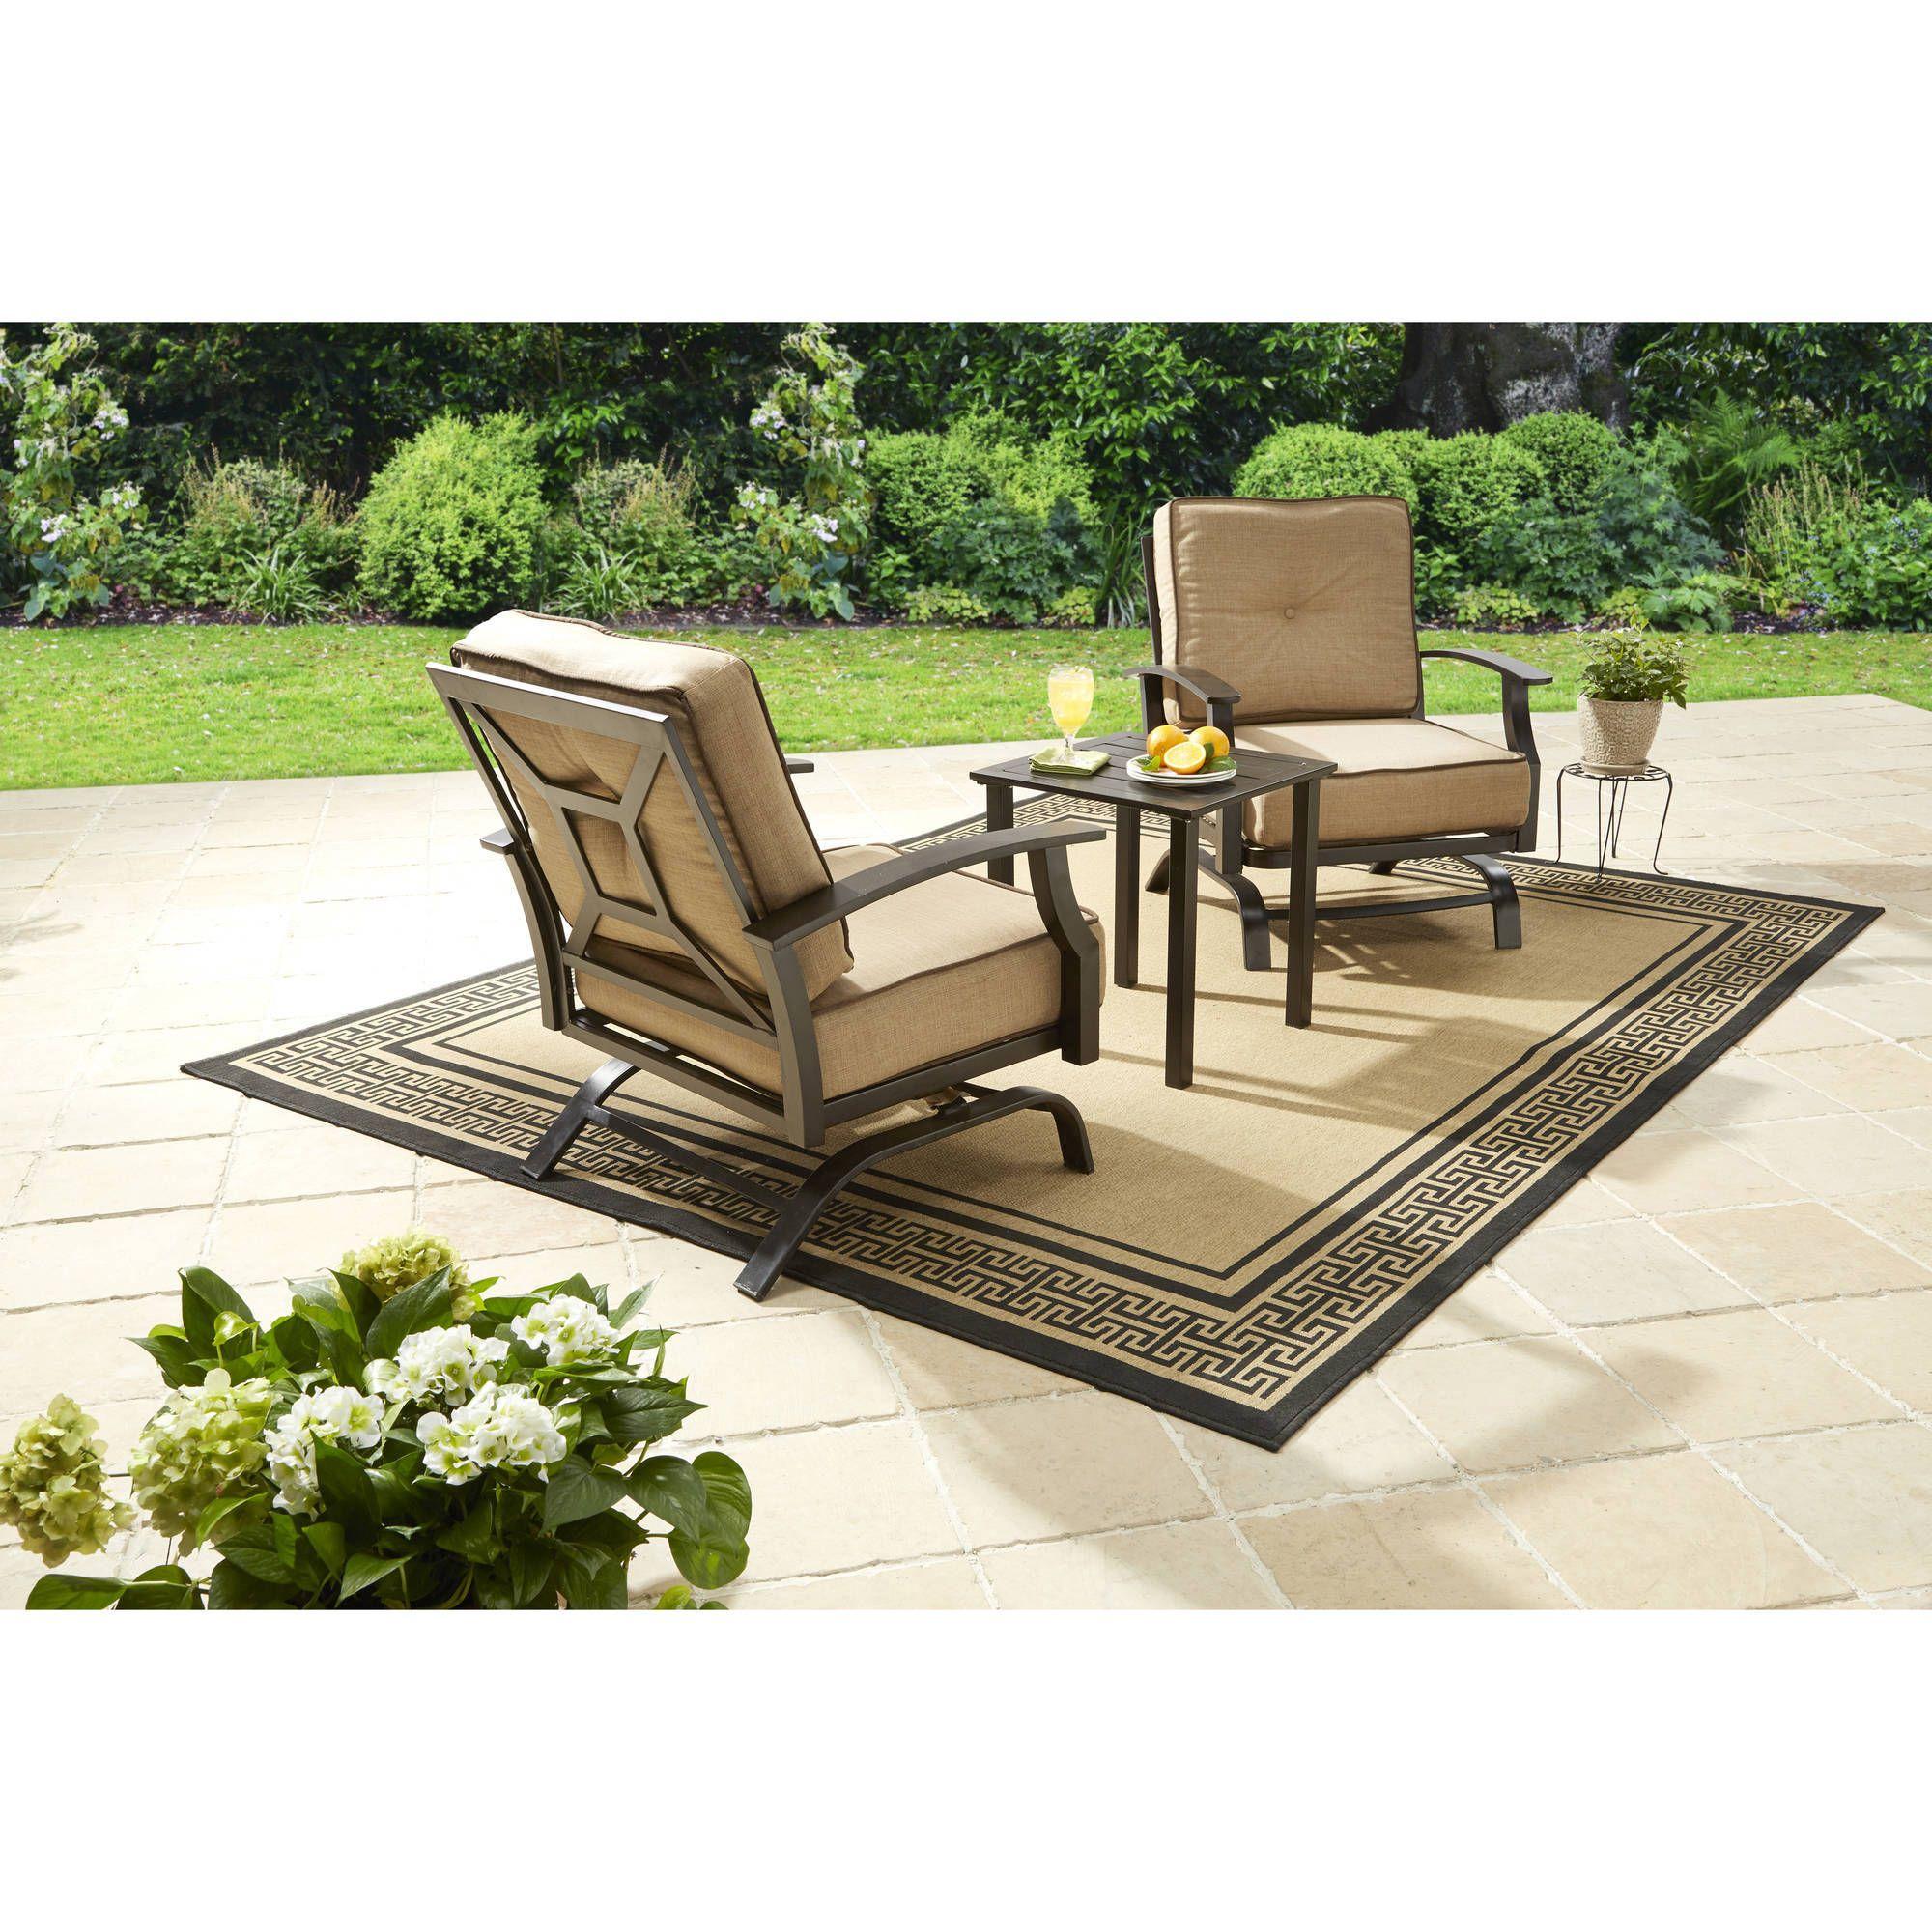 Delicieux Better Homes And Gardens Carter Hills 3 Piece Outdoor Chat Set   Walmart.com